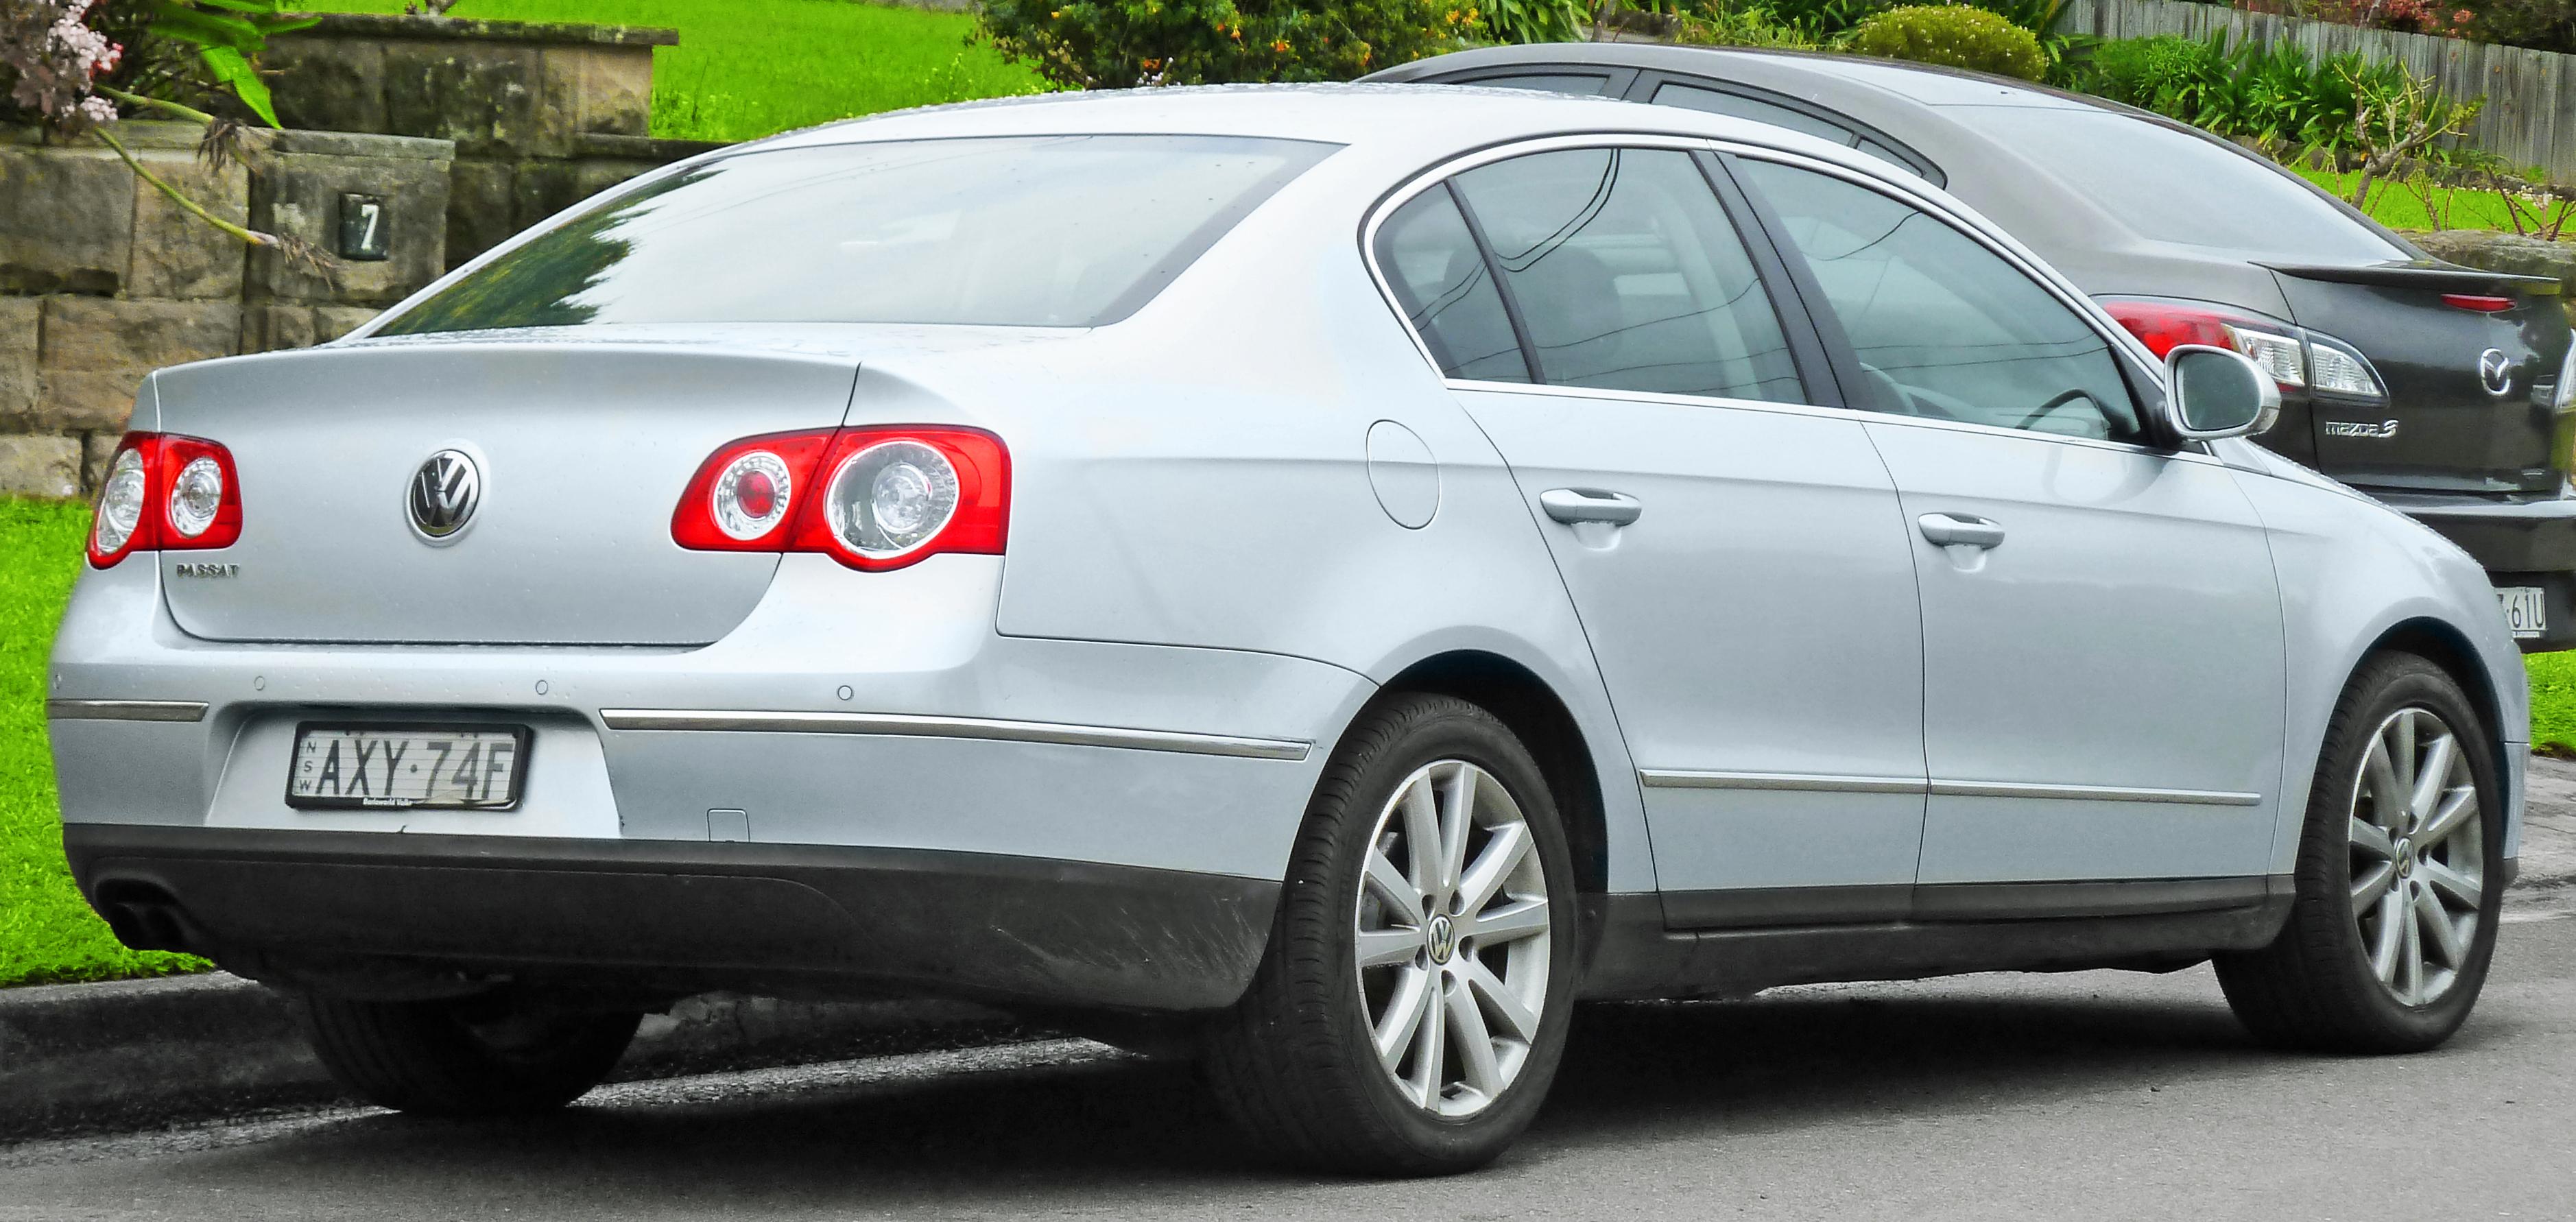 research composite silver ends volkswagen large reflex metallic groovecar cc sport sedan